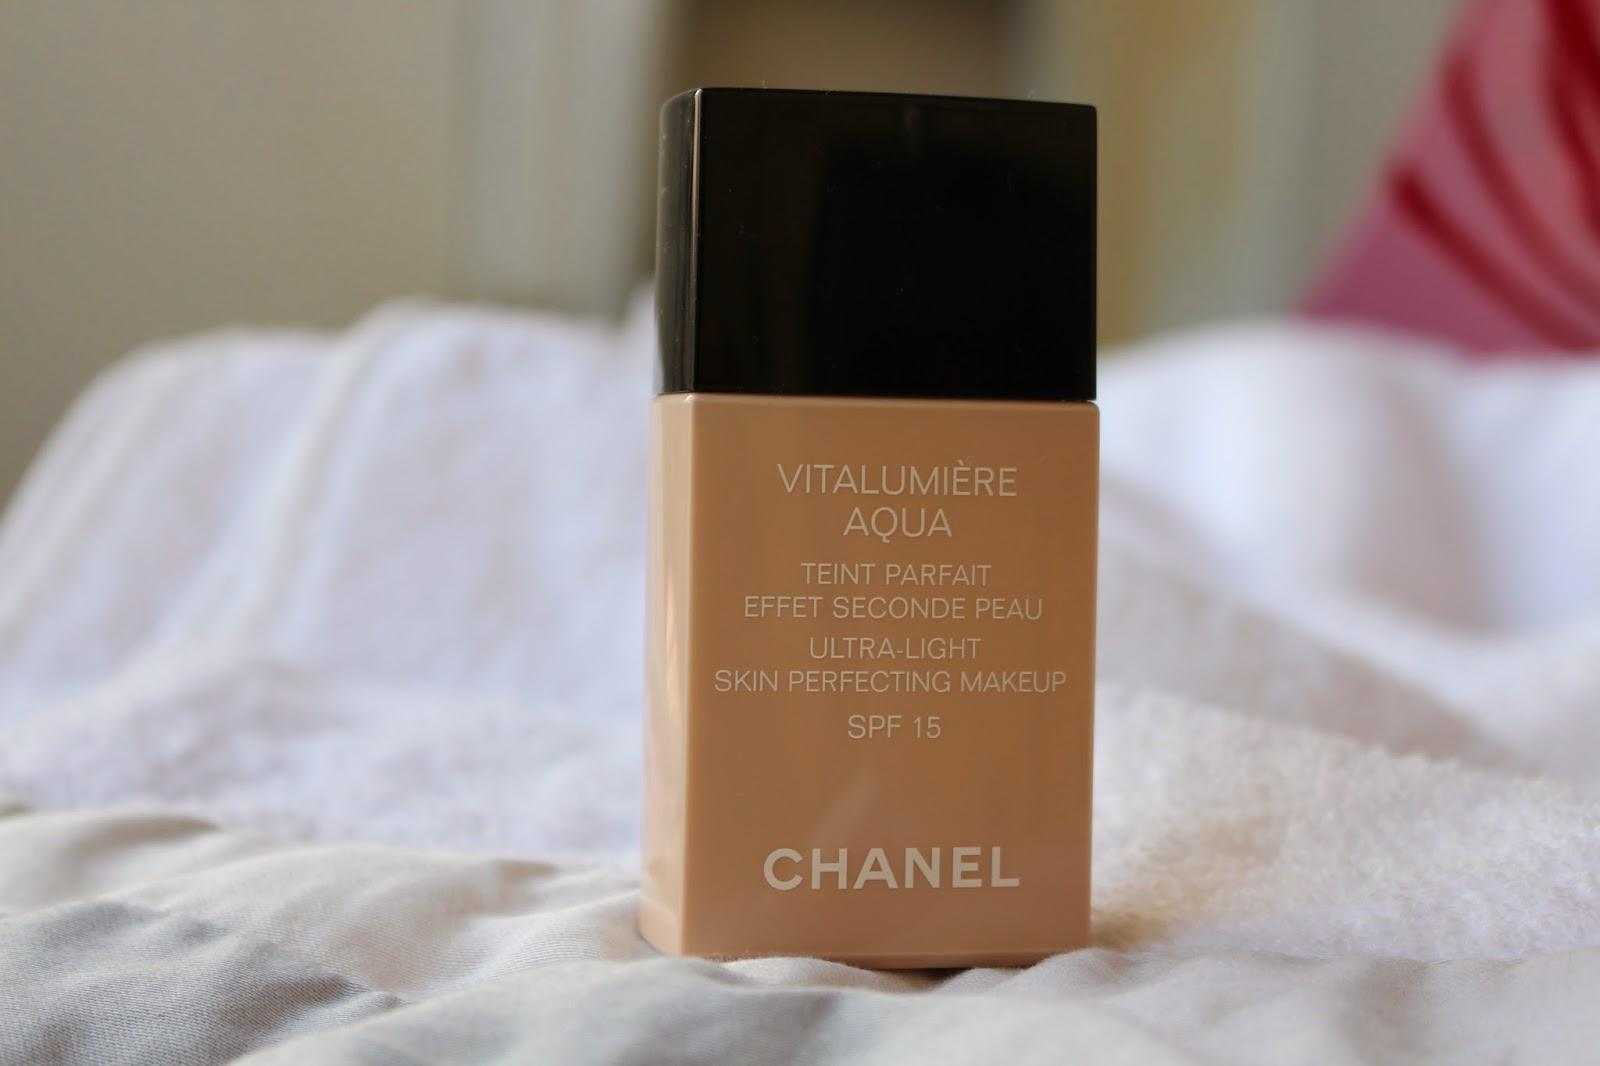 Chanel Vitalumiere Aqua